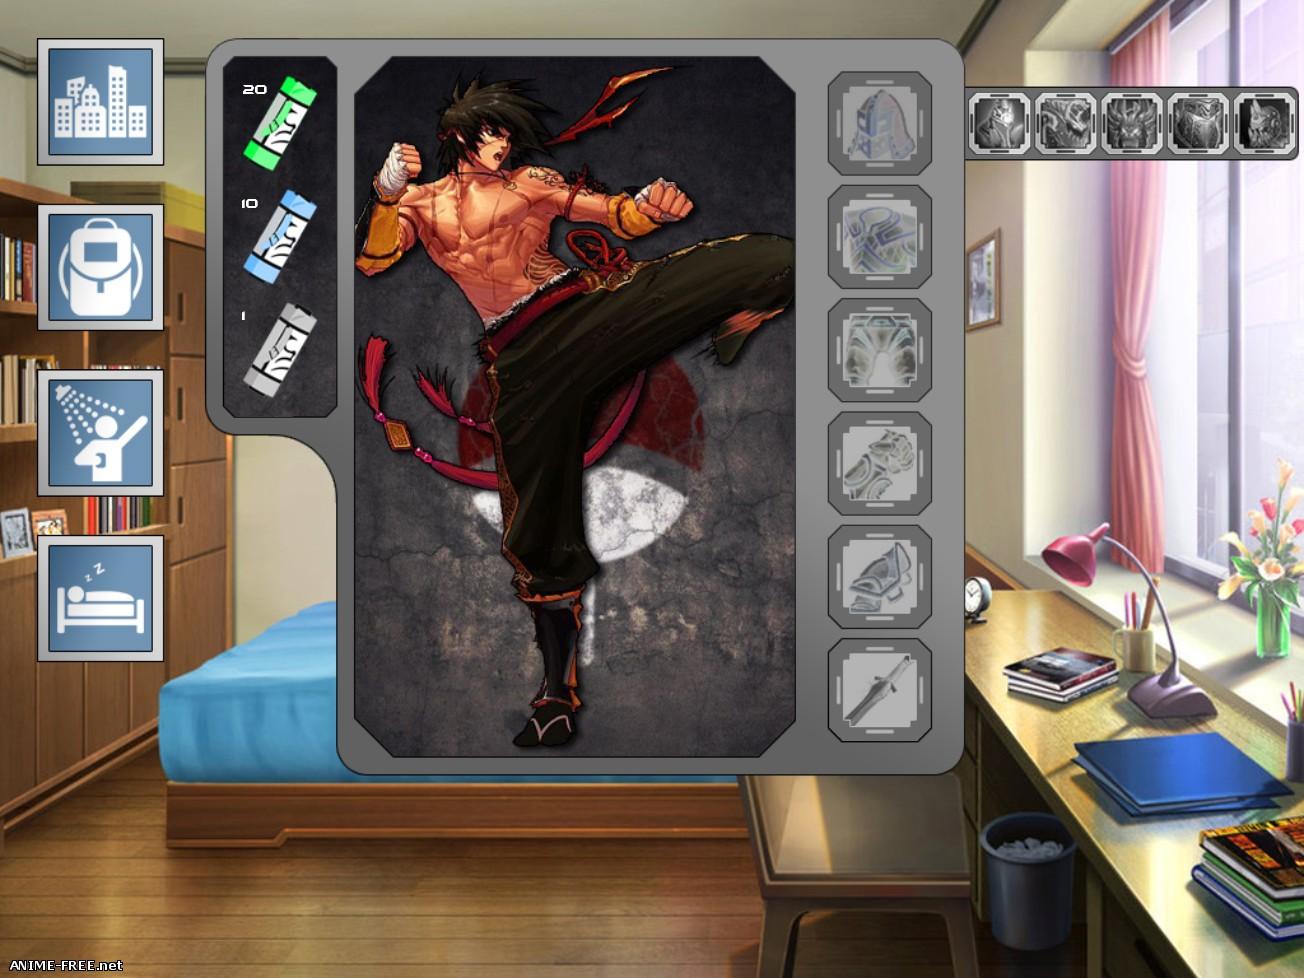 Naruto: Last Hokage / Наруто: Последний Хокаге [2017] [Uncen] [Fighting, ADV, RPG] [RUS] H-Game